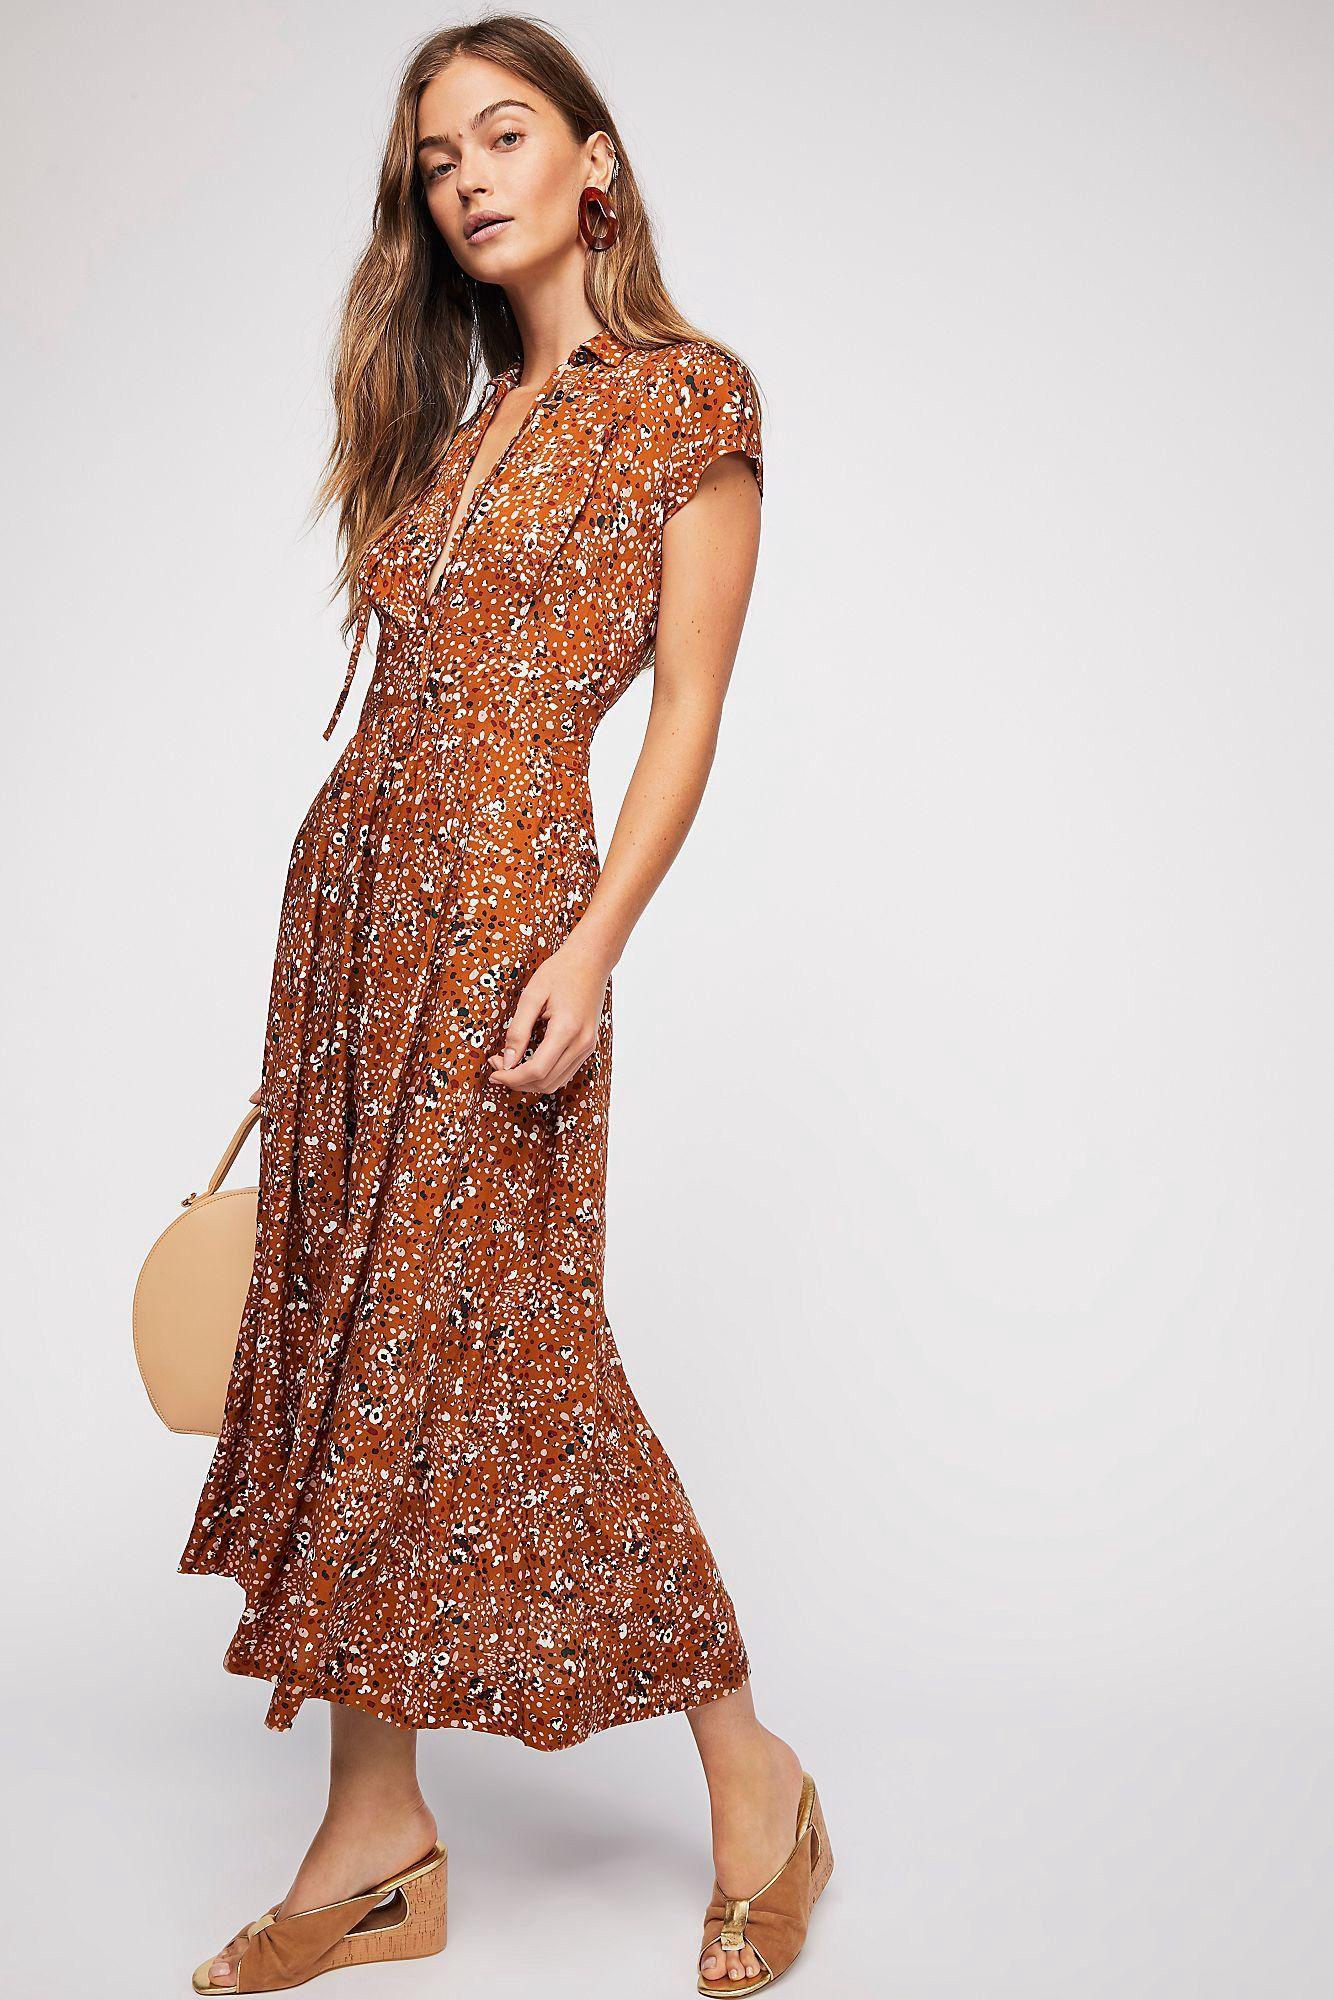 d72a55aec7f Free People  40S Printed Midi Dress - Maraschino Cherry 10 ...